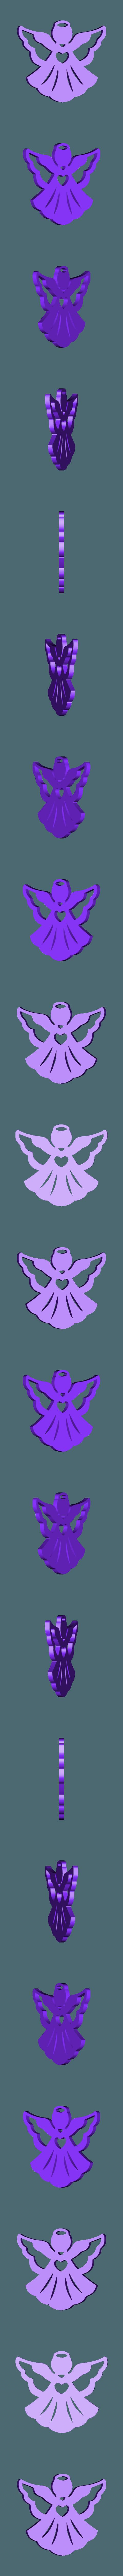 Angel 3.stl Download STL file key chain angel • 3D printing design, abauerenator